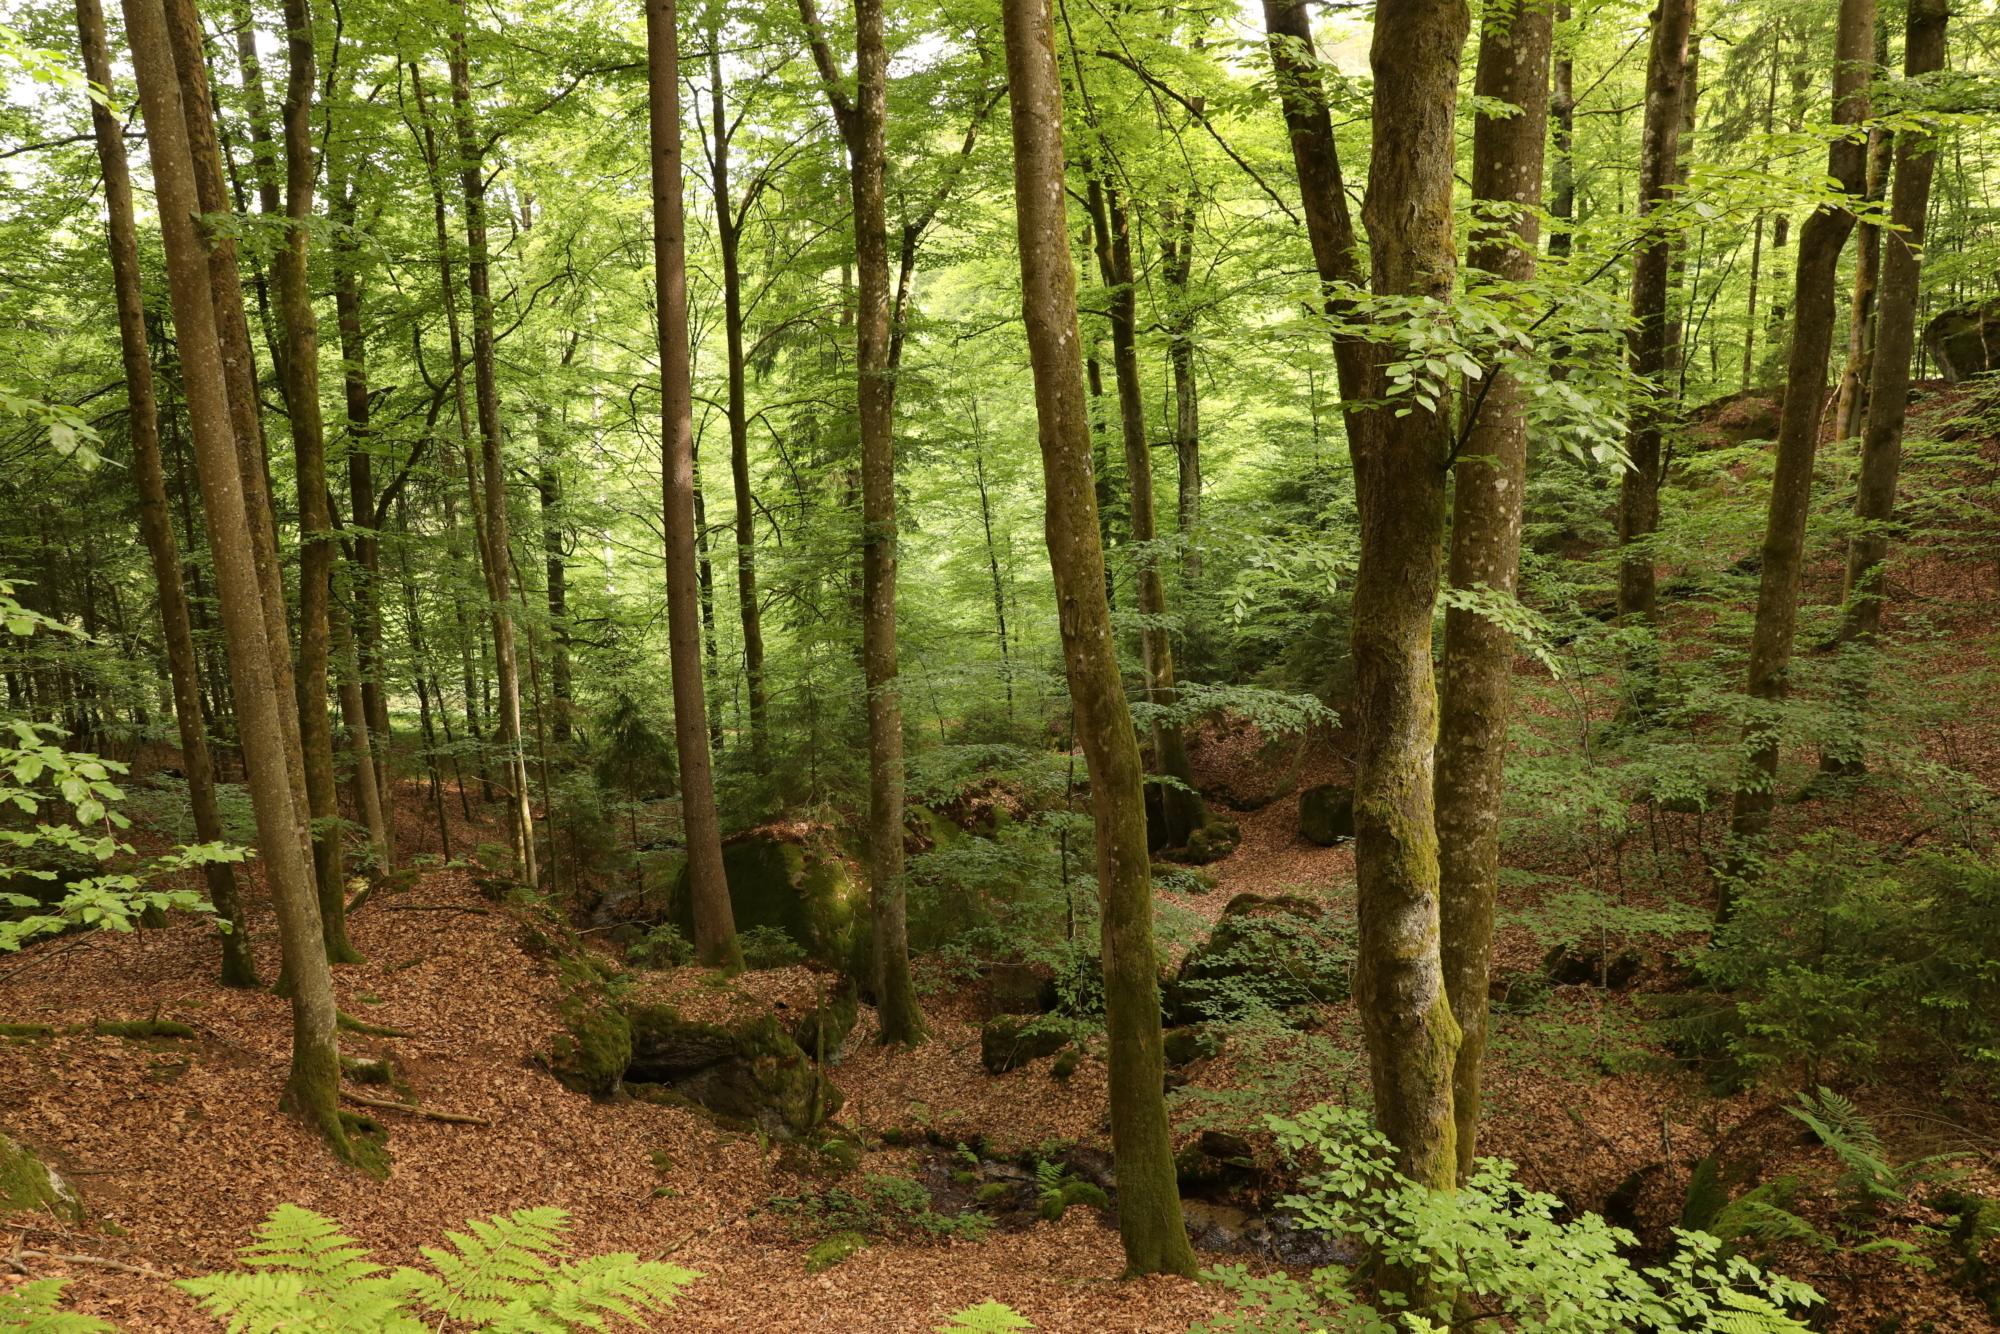 210604 Lebendiger Wald 7